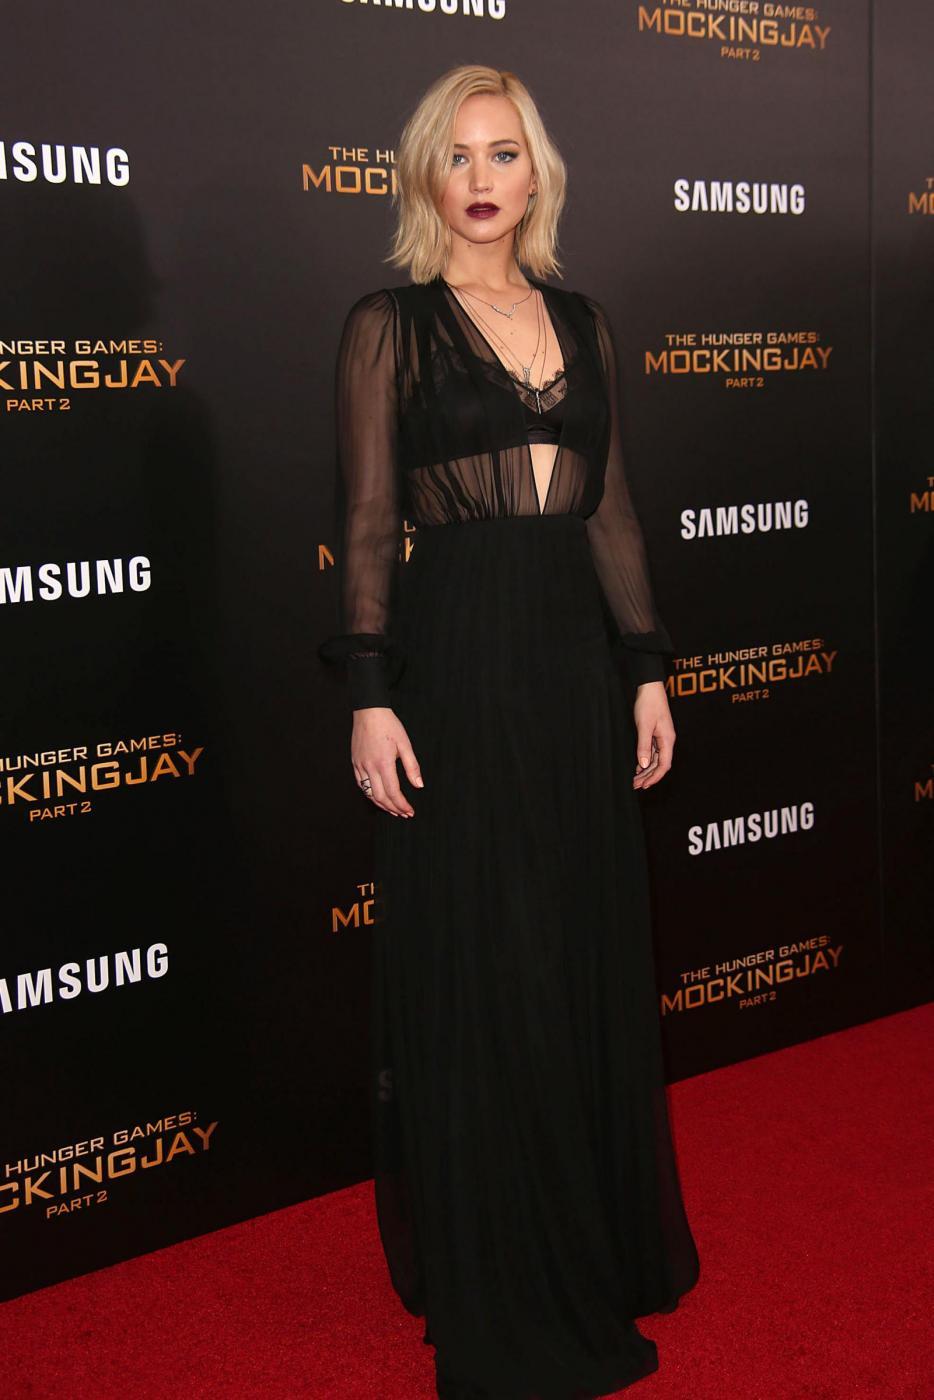 Jennifer Lawrence: reggiseno in bella vista a New York FOTO 6